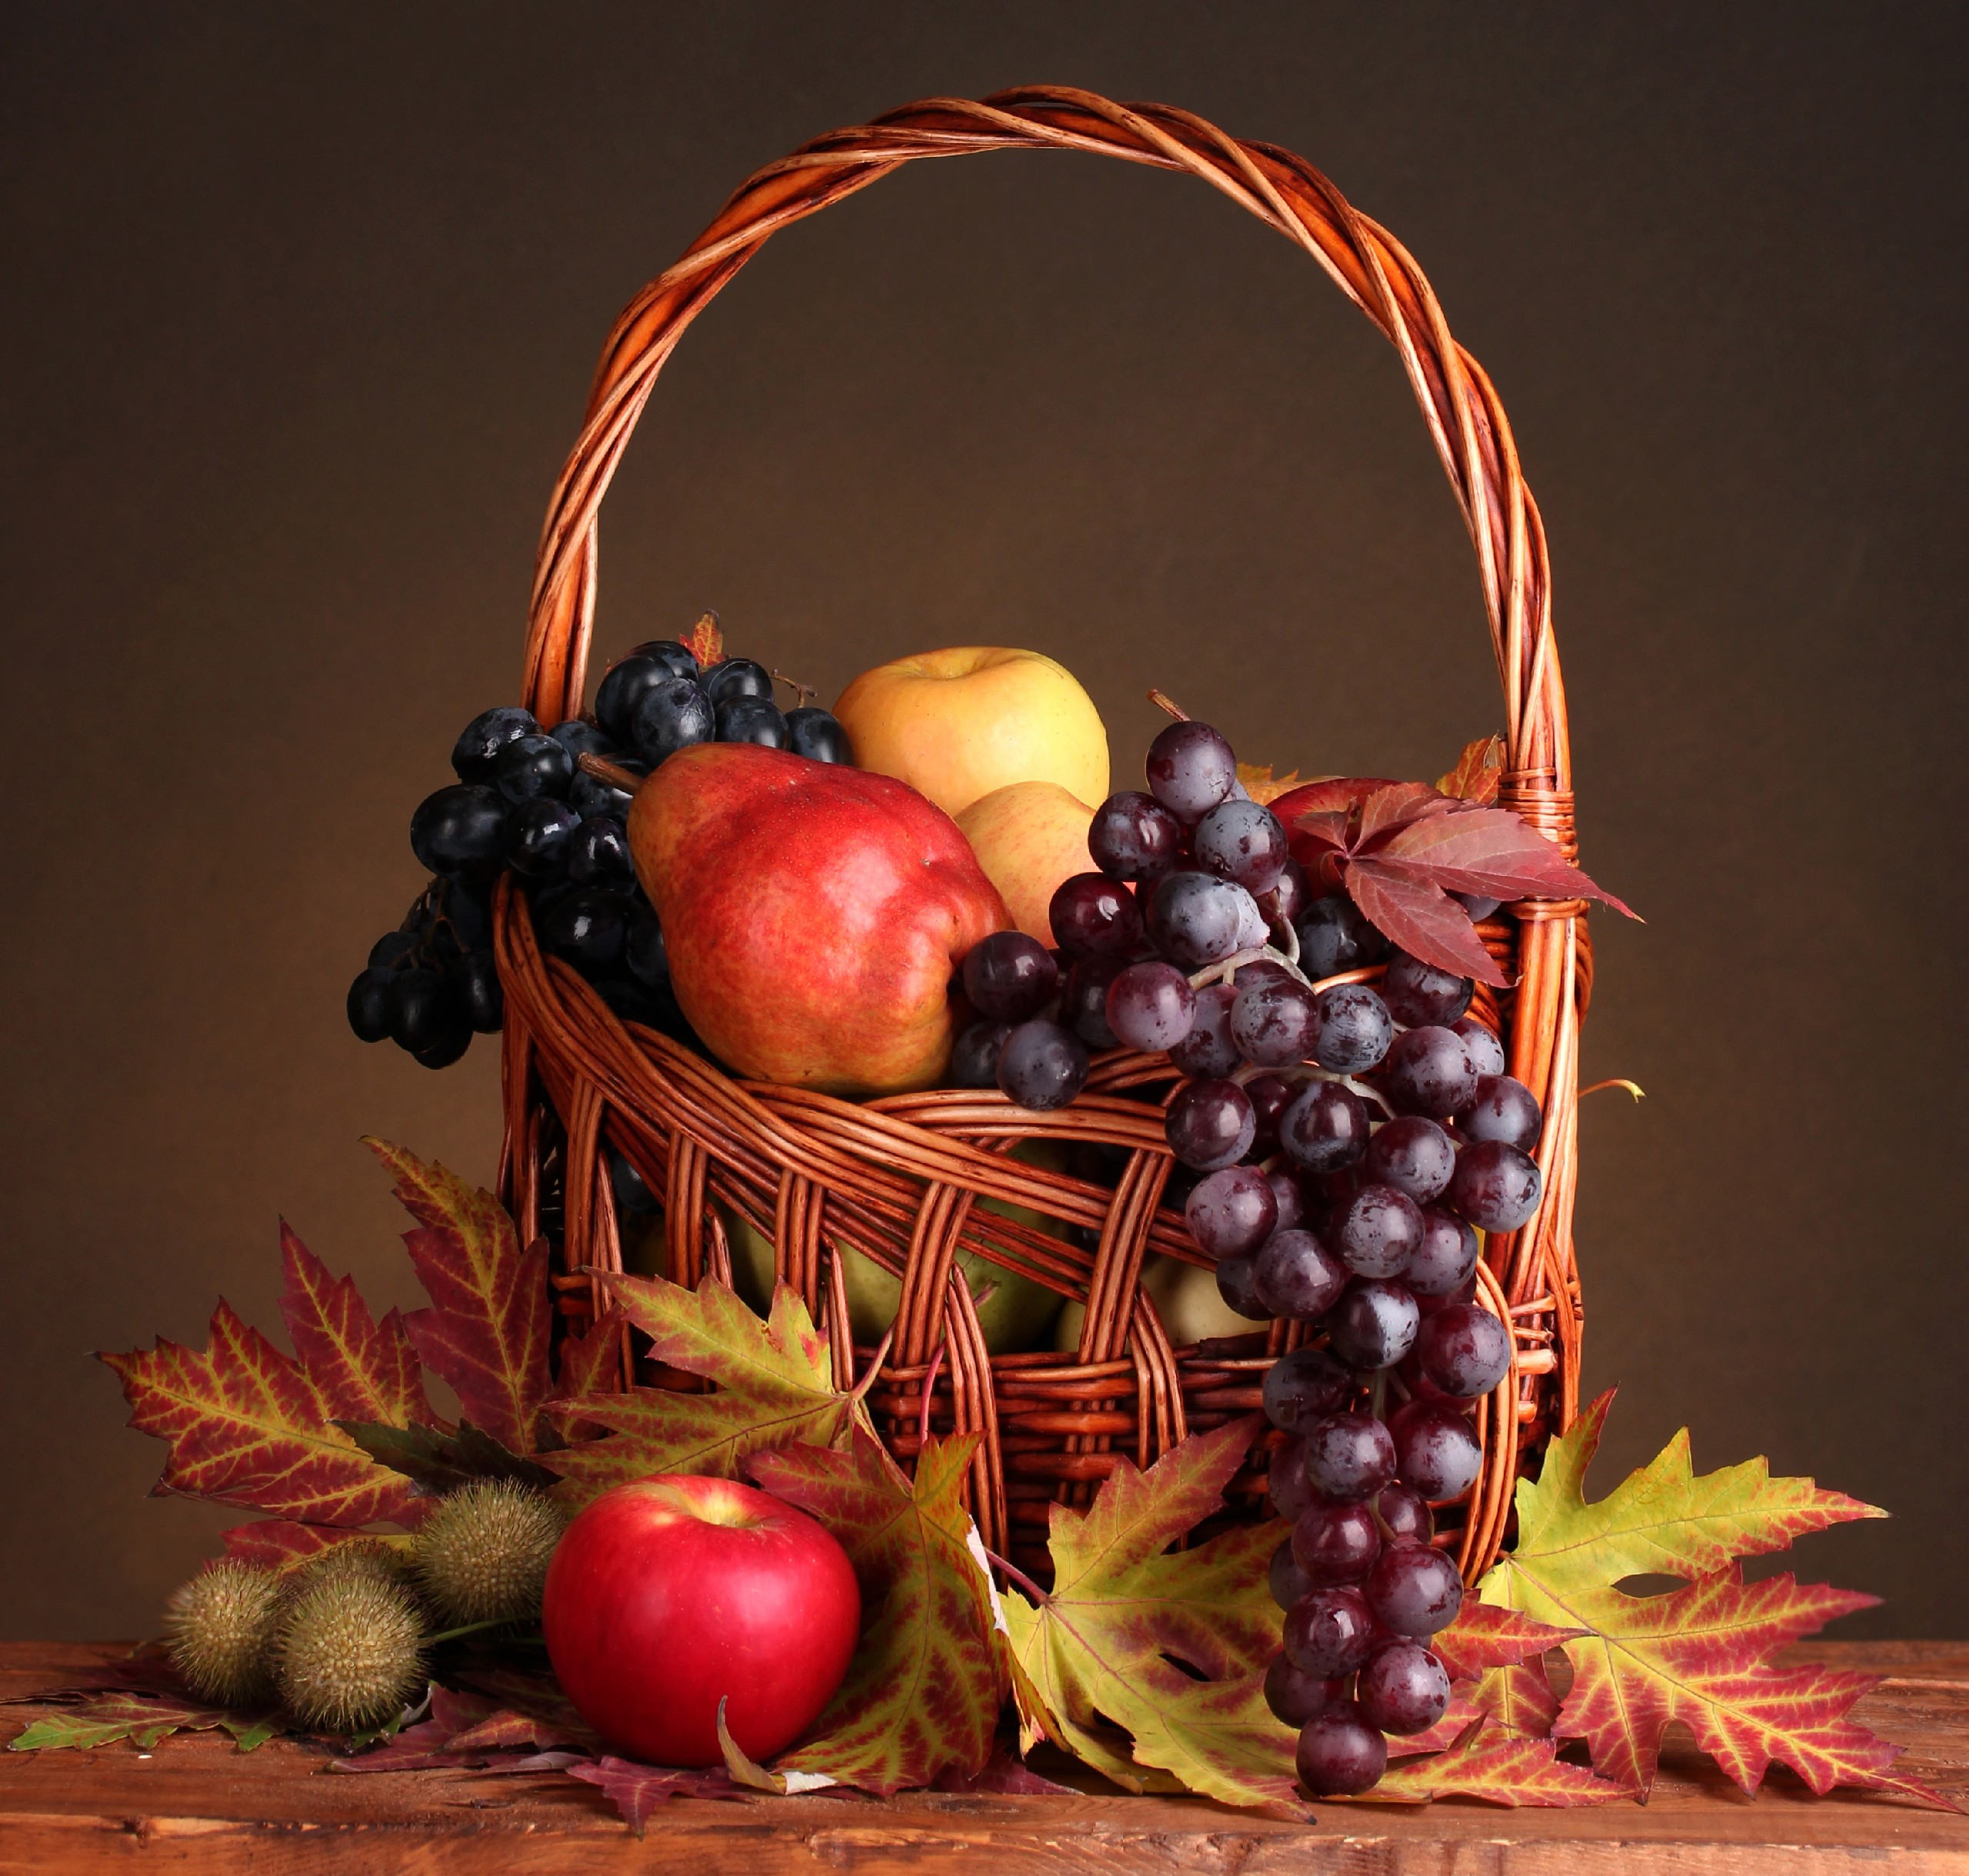 Картинки фрукты и ягоды натюрморты